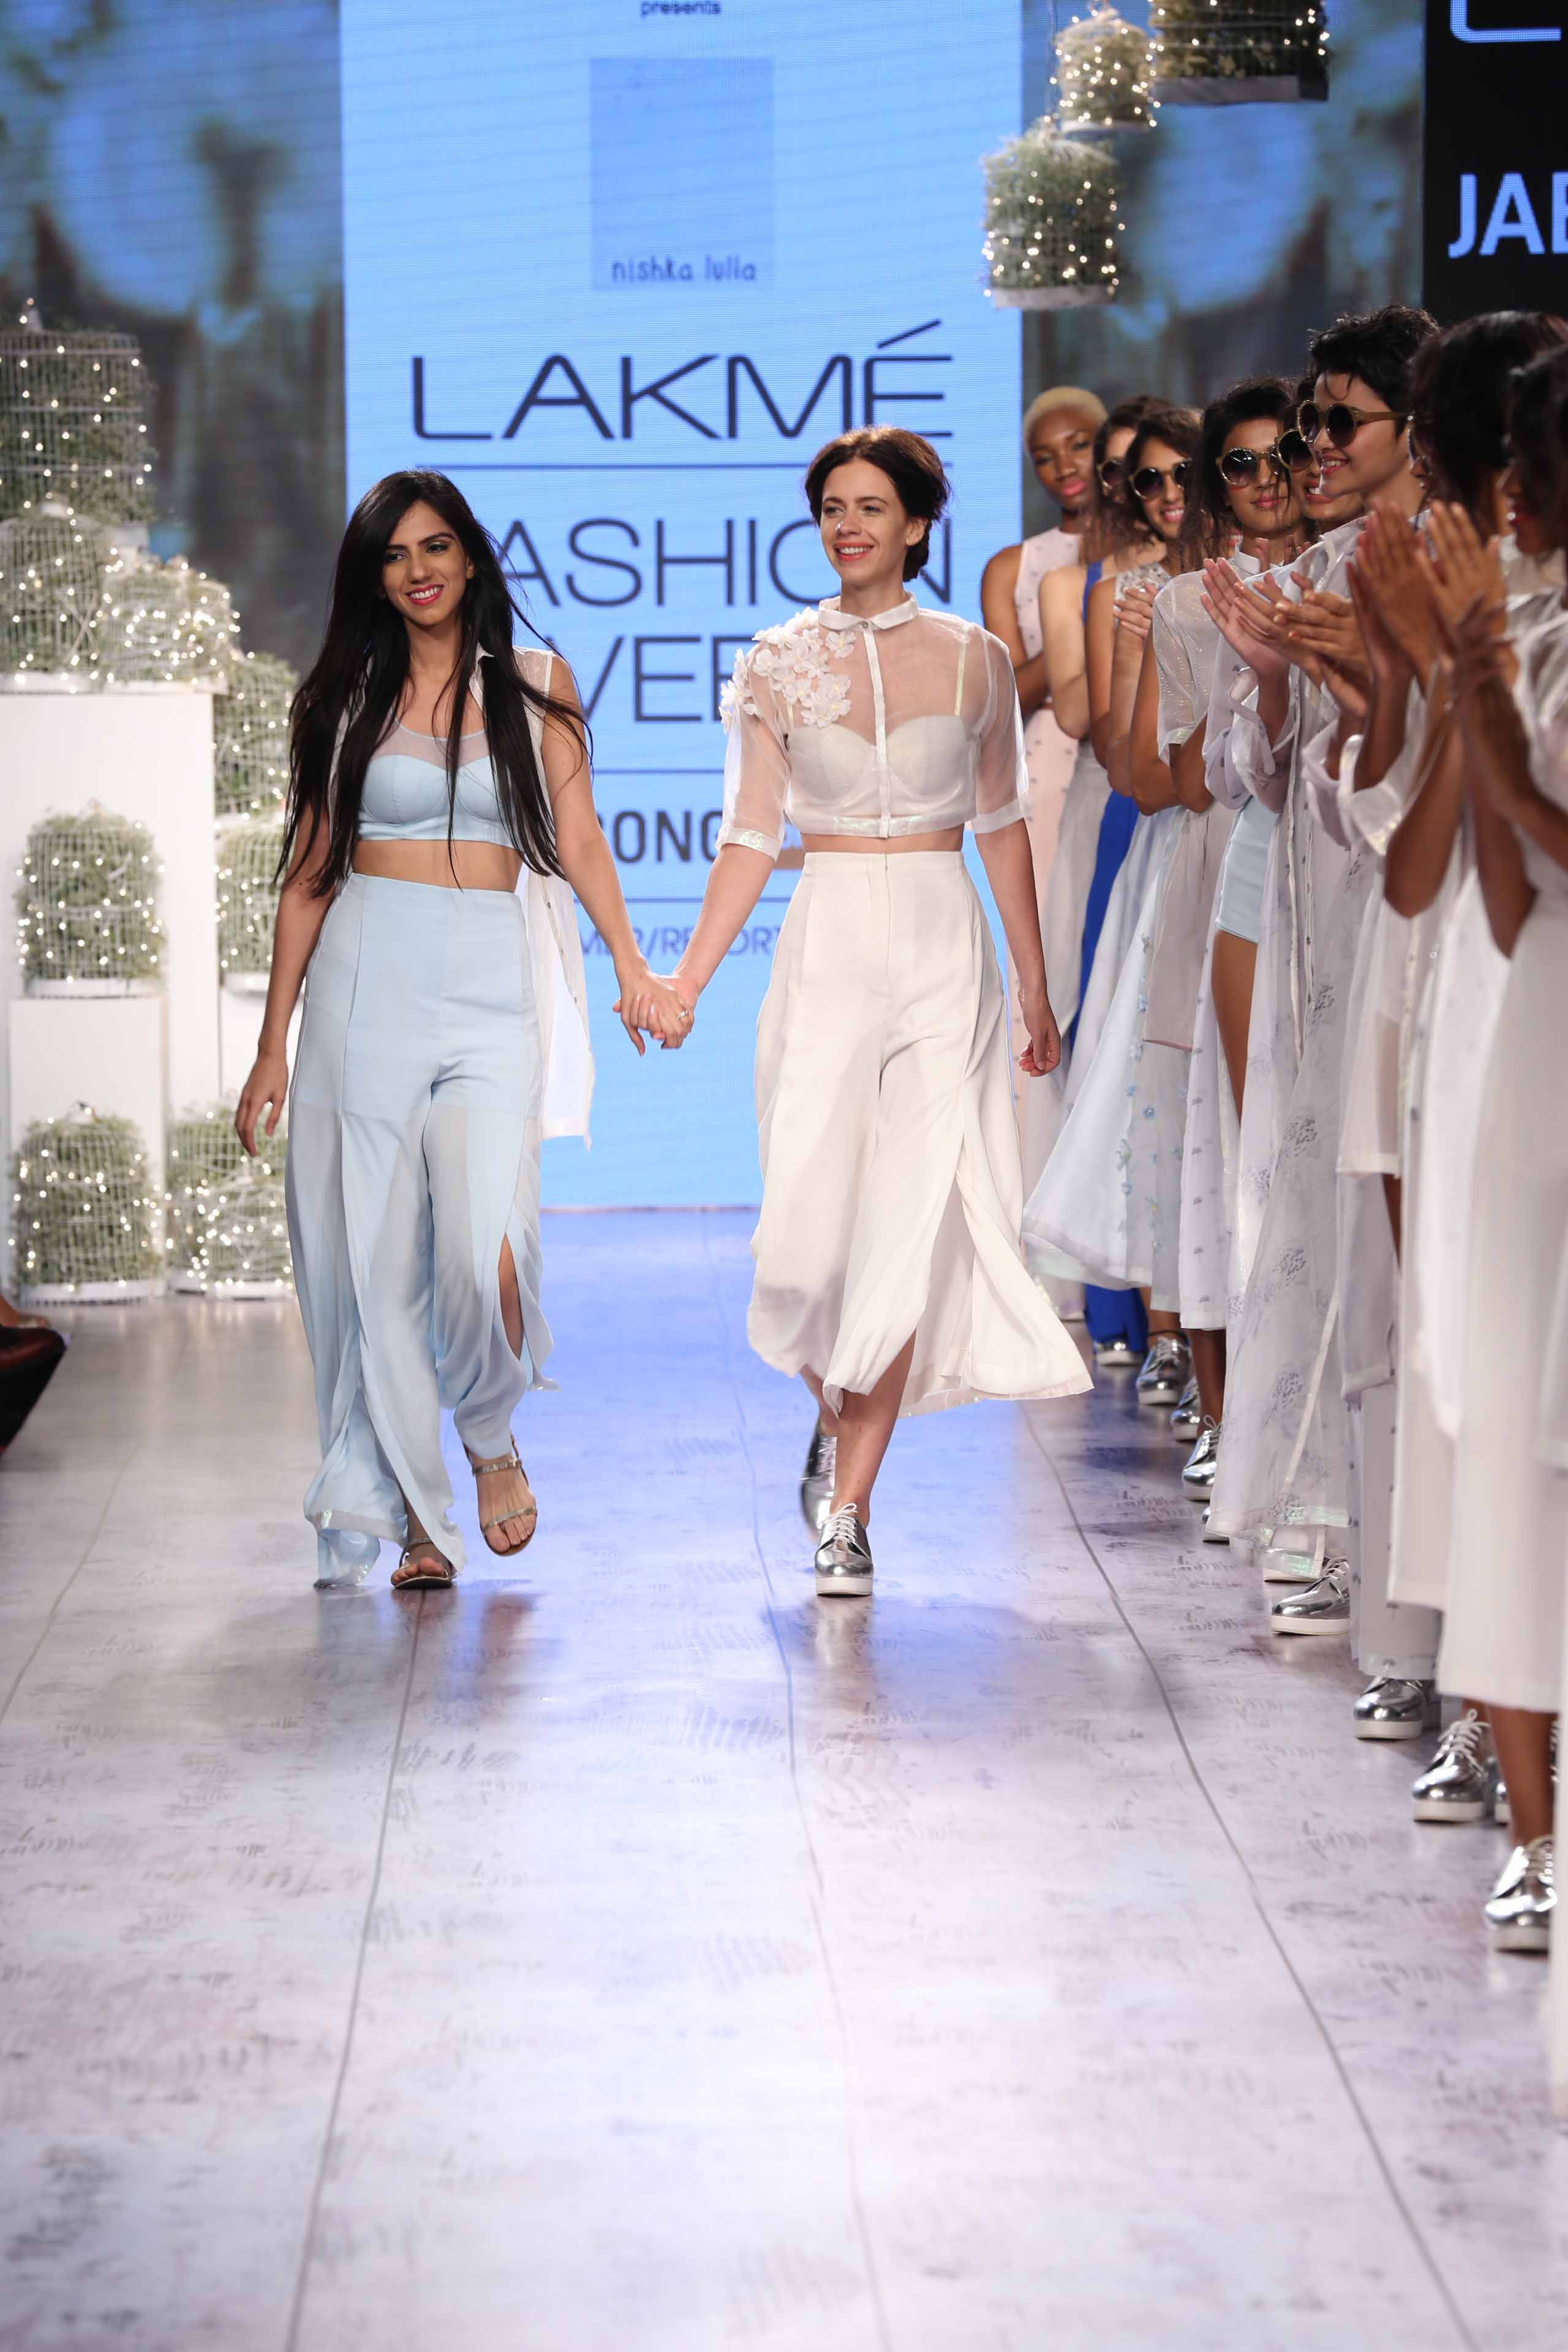 Nishka Lulla S Fuss Free Approach To Boho Chic Turns Heads At Lakme Fashion Week Urban Asian